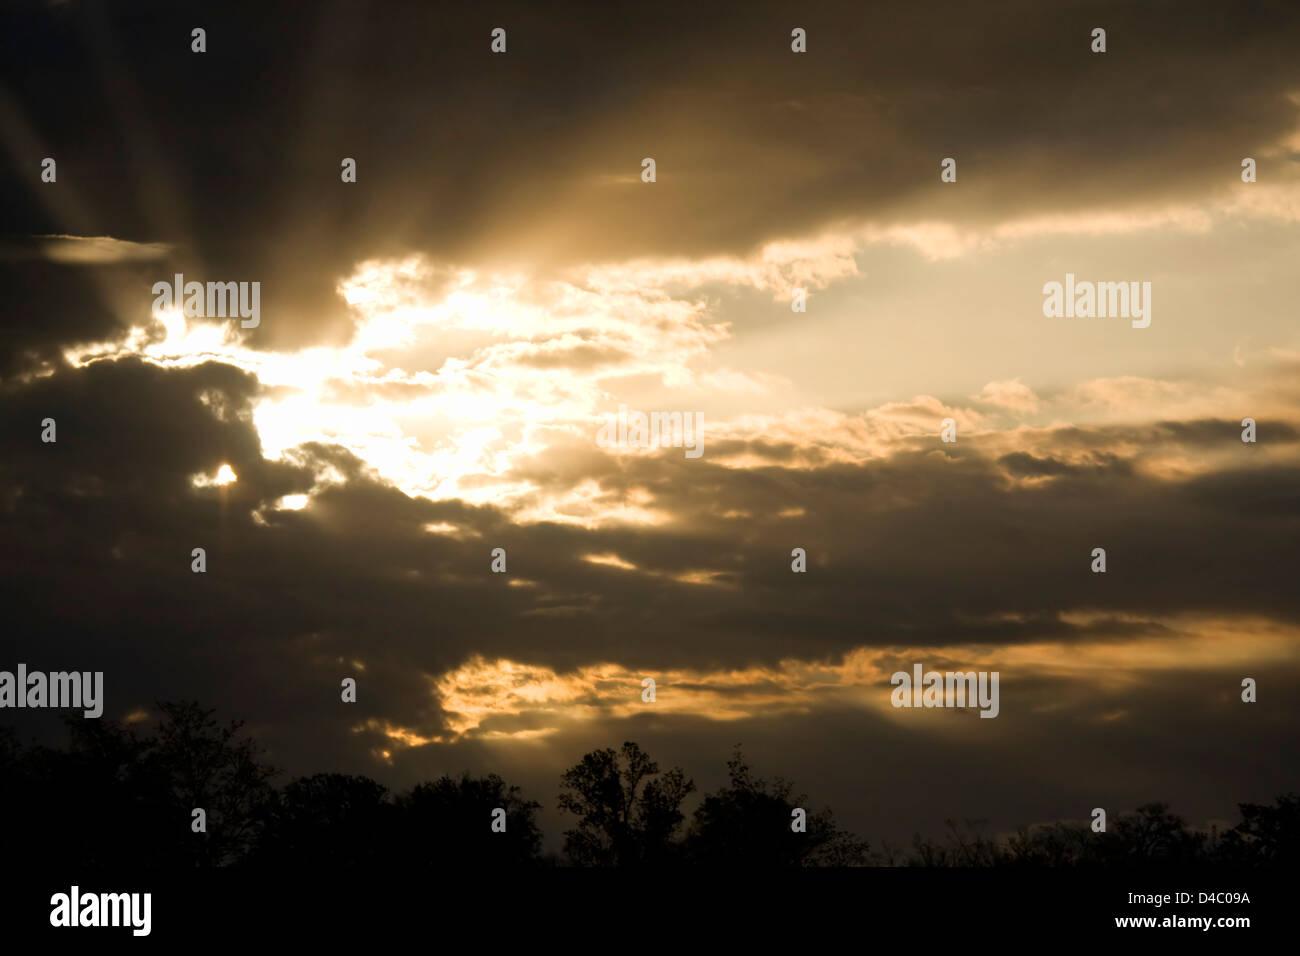 Rays of sun bursting through storm clouds. Stock Photo